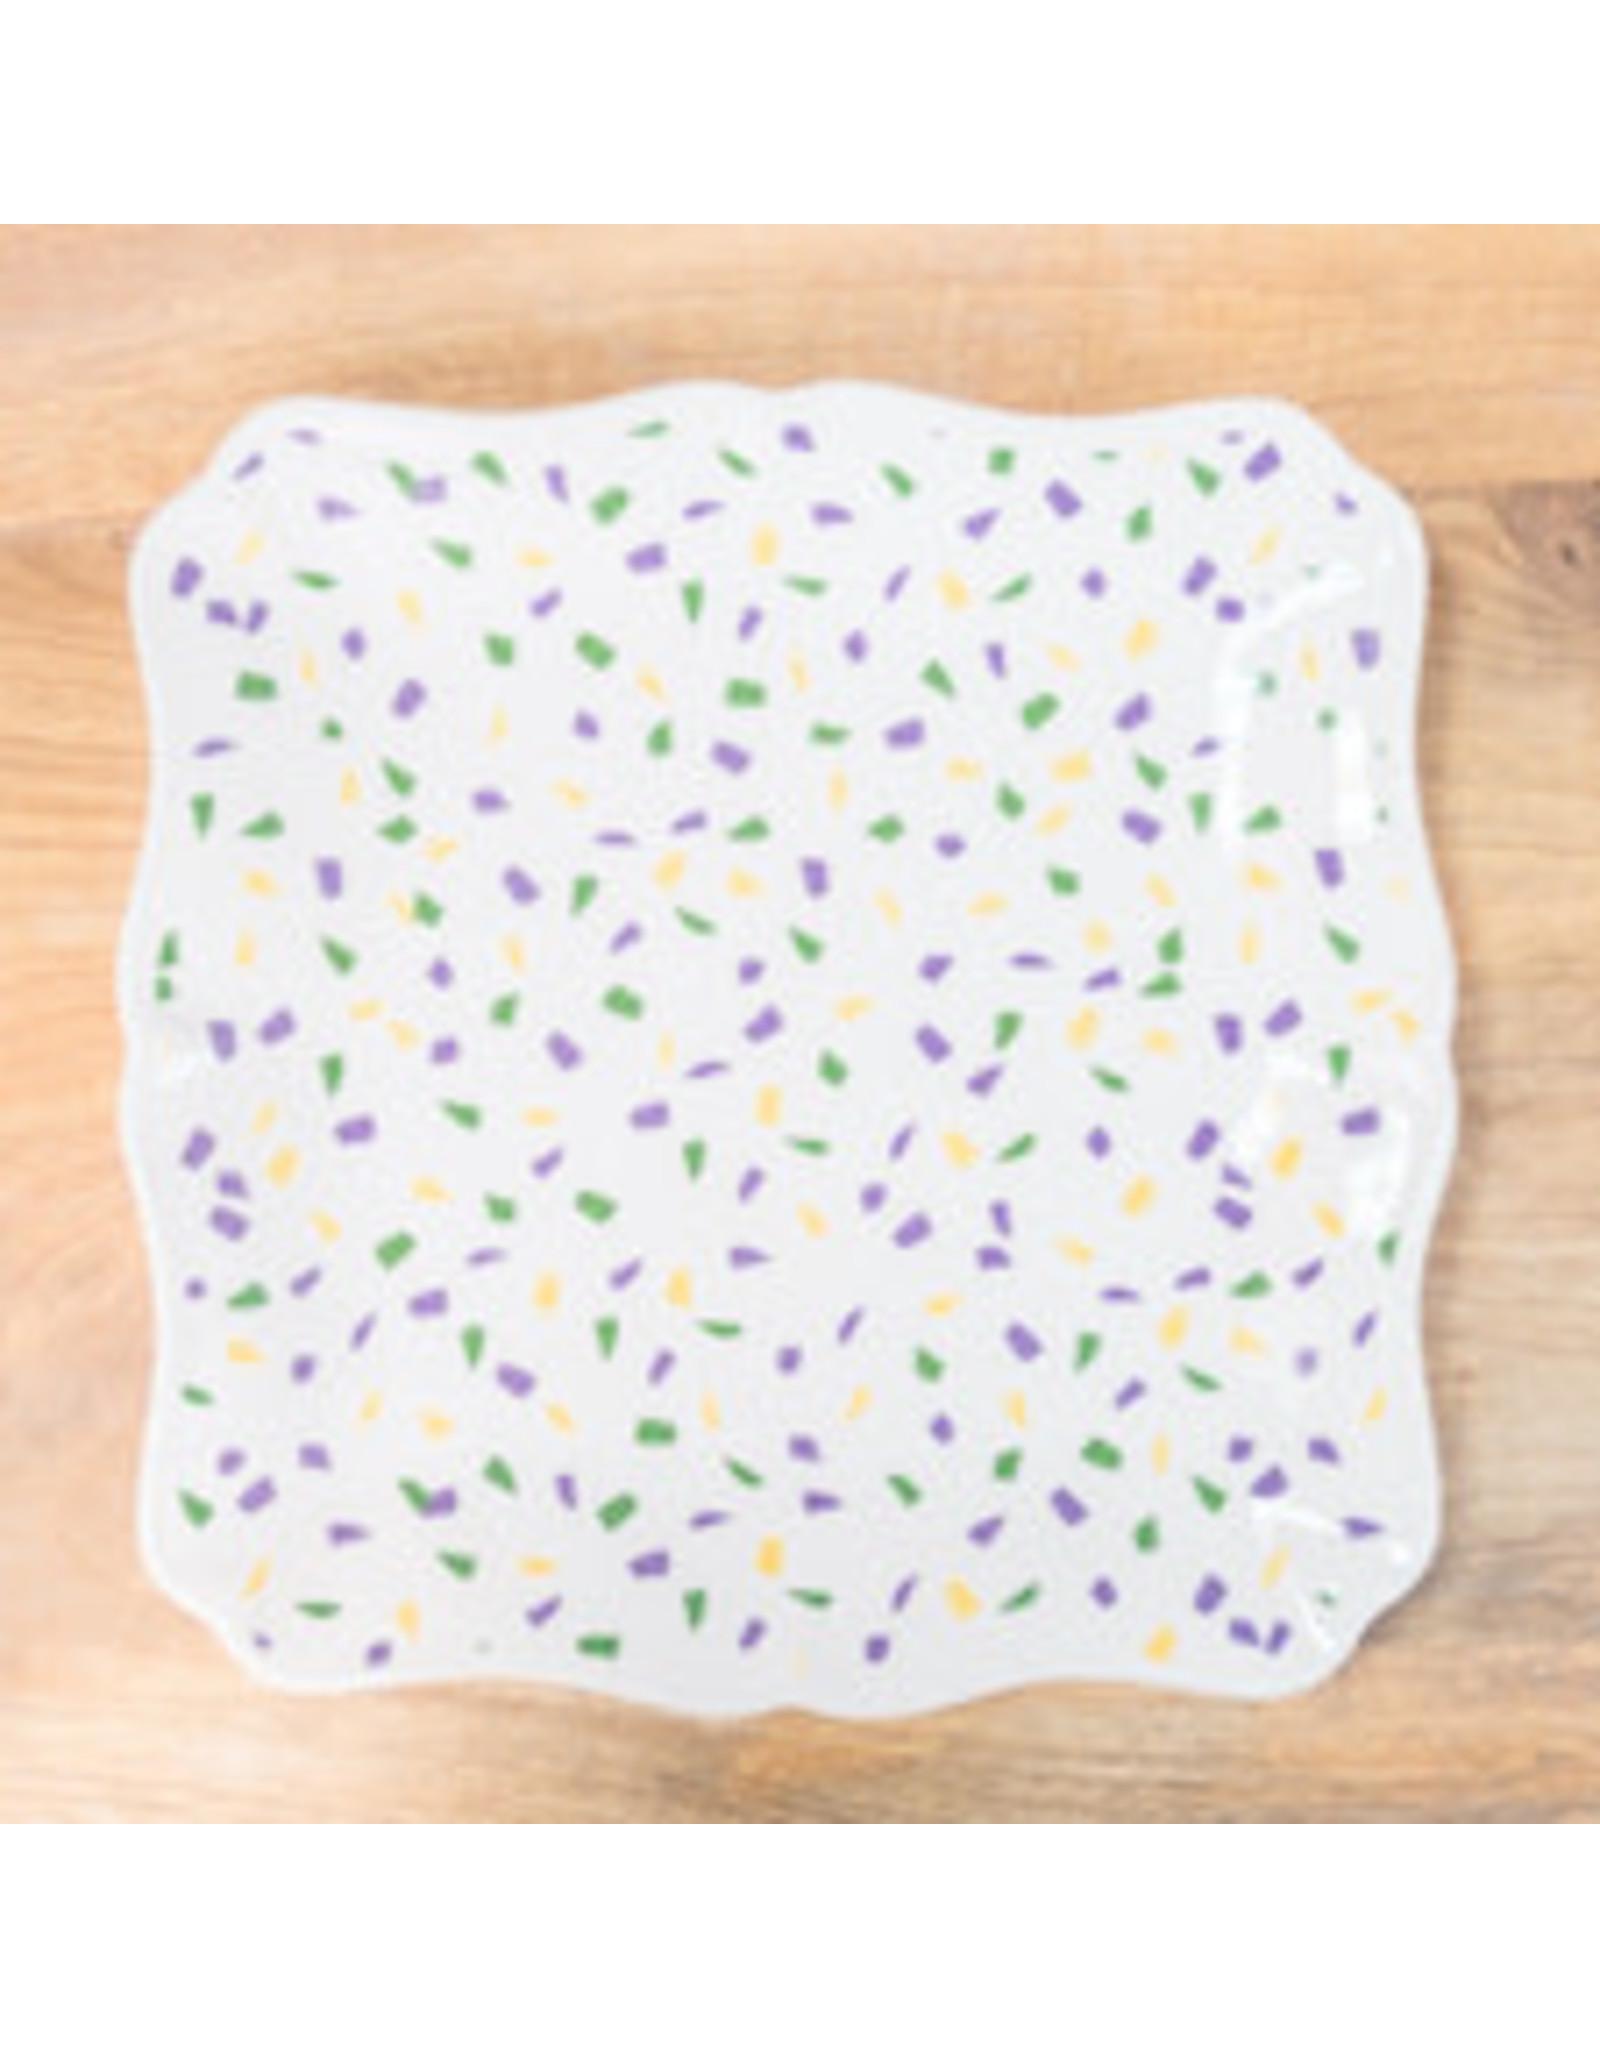 The Royal Standard Confetti Platter